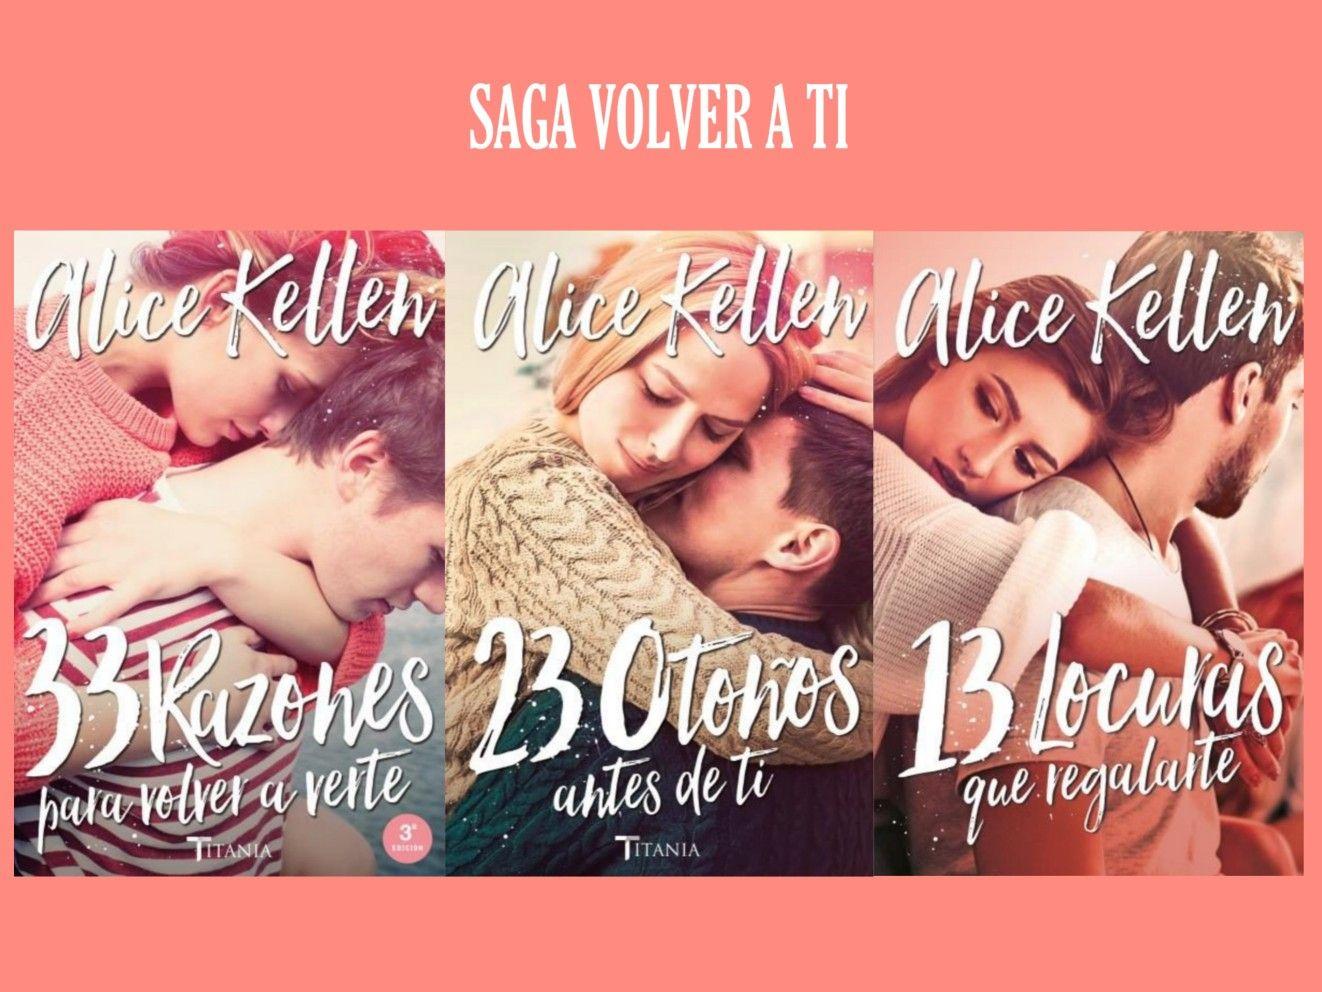 Saga Volver A Ti Alice Kellen 33 Razones Para Volver A Verte 23 Otoños Antes De Ti Libros Para Leer Juveniles Rincones De Libros Libros De Romance Juvenil